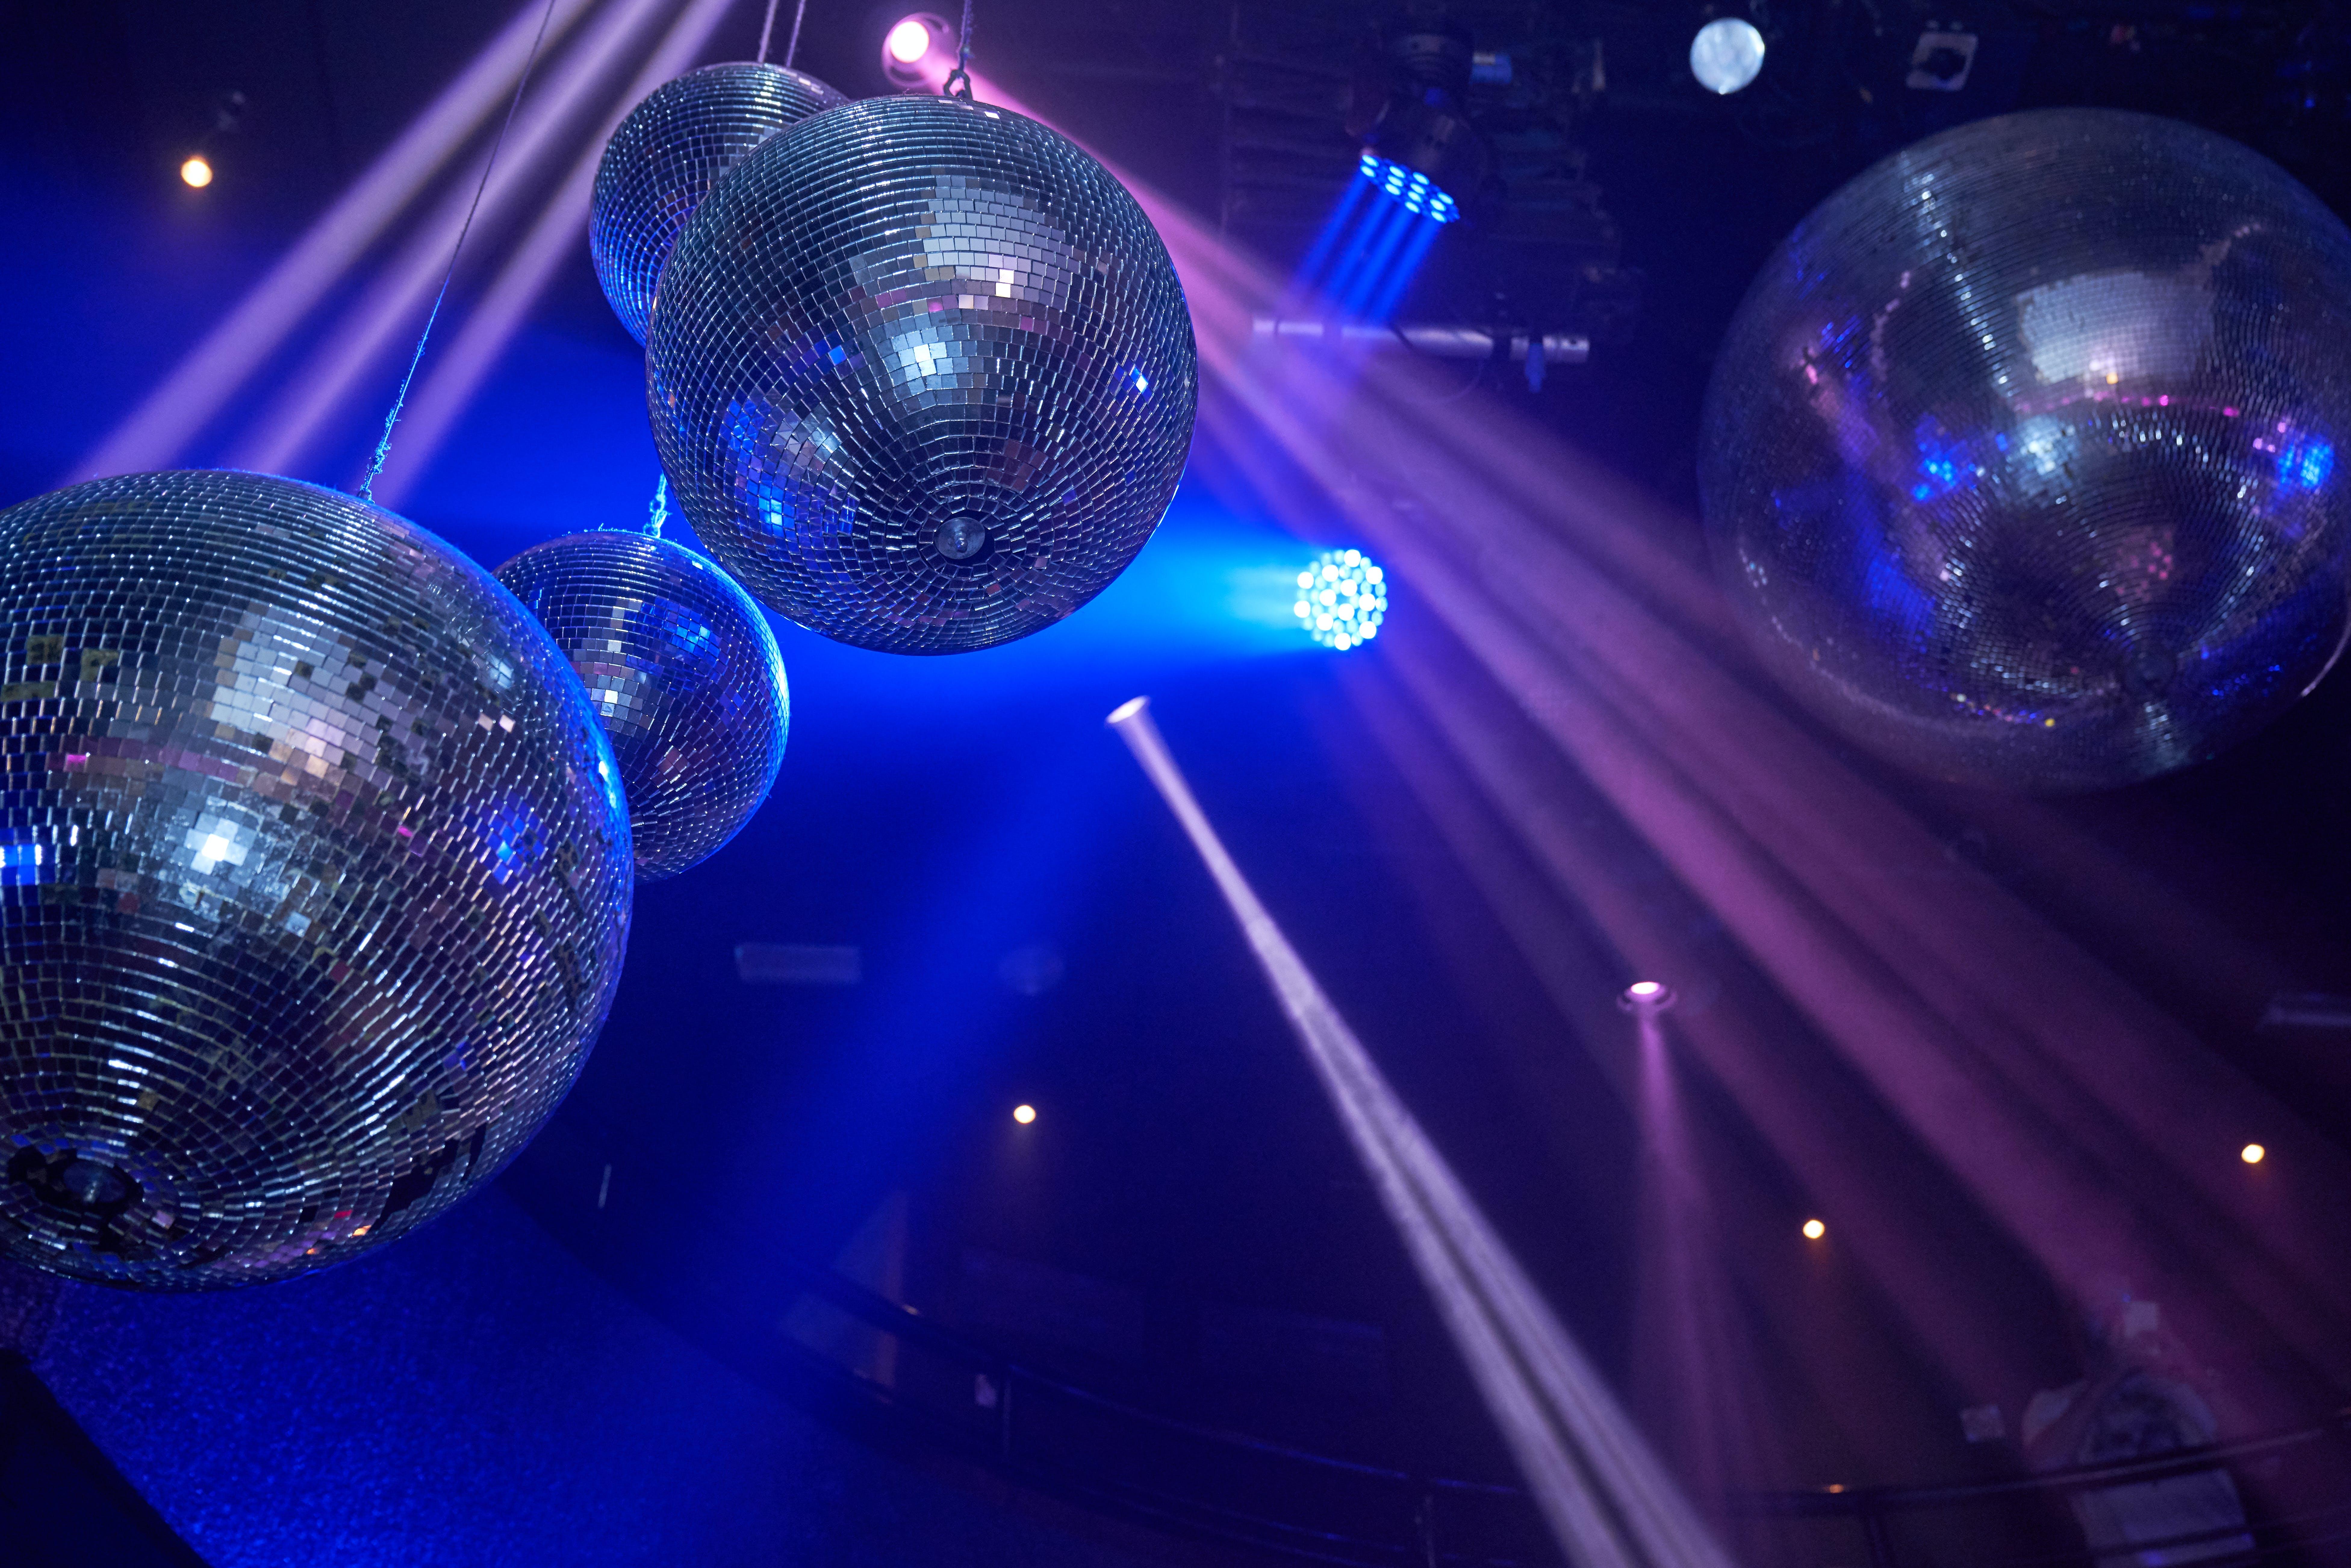 Free stock photo of disco, disco ball, discotheque, glamour party